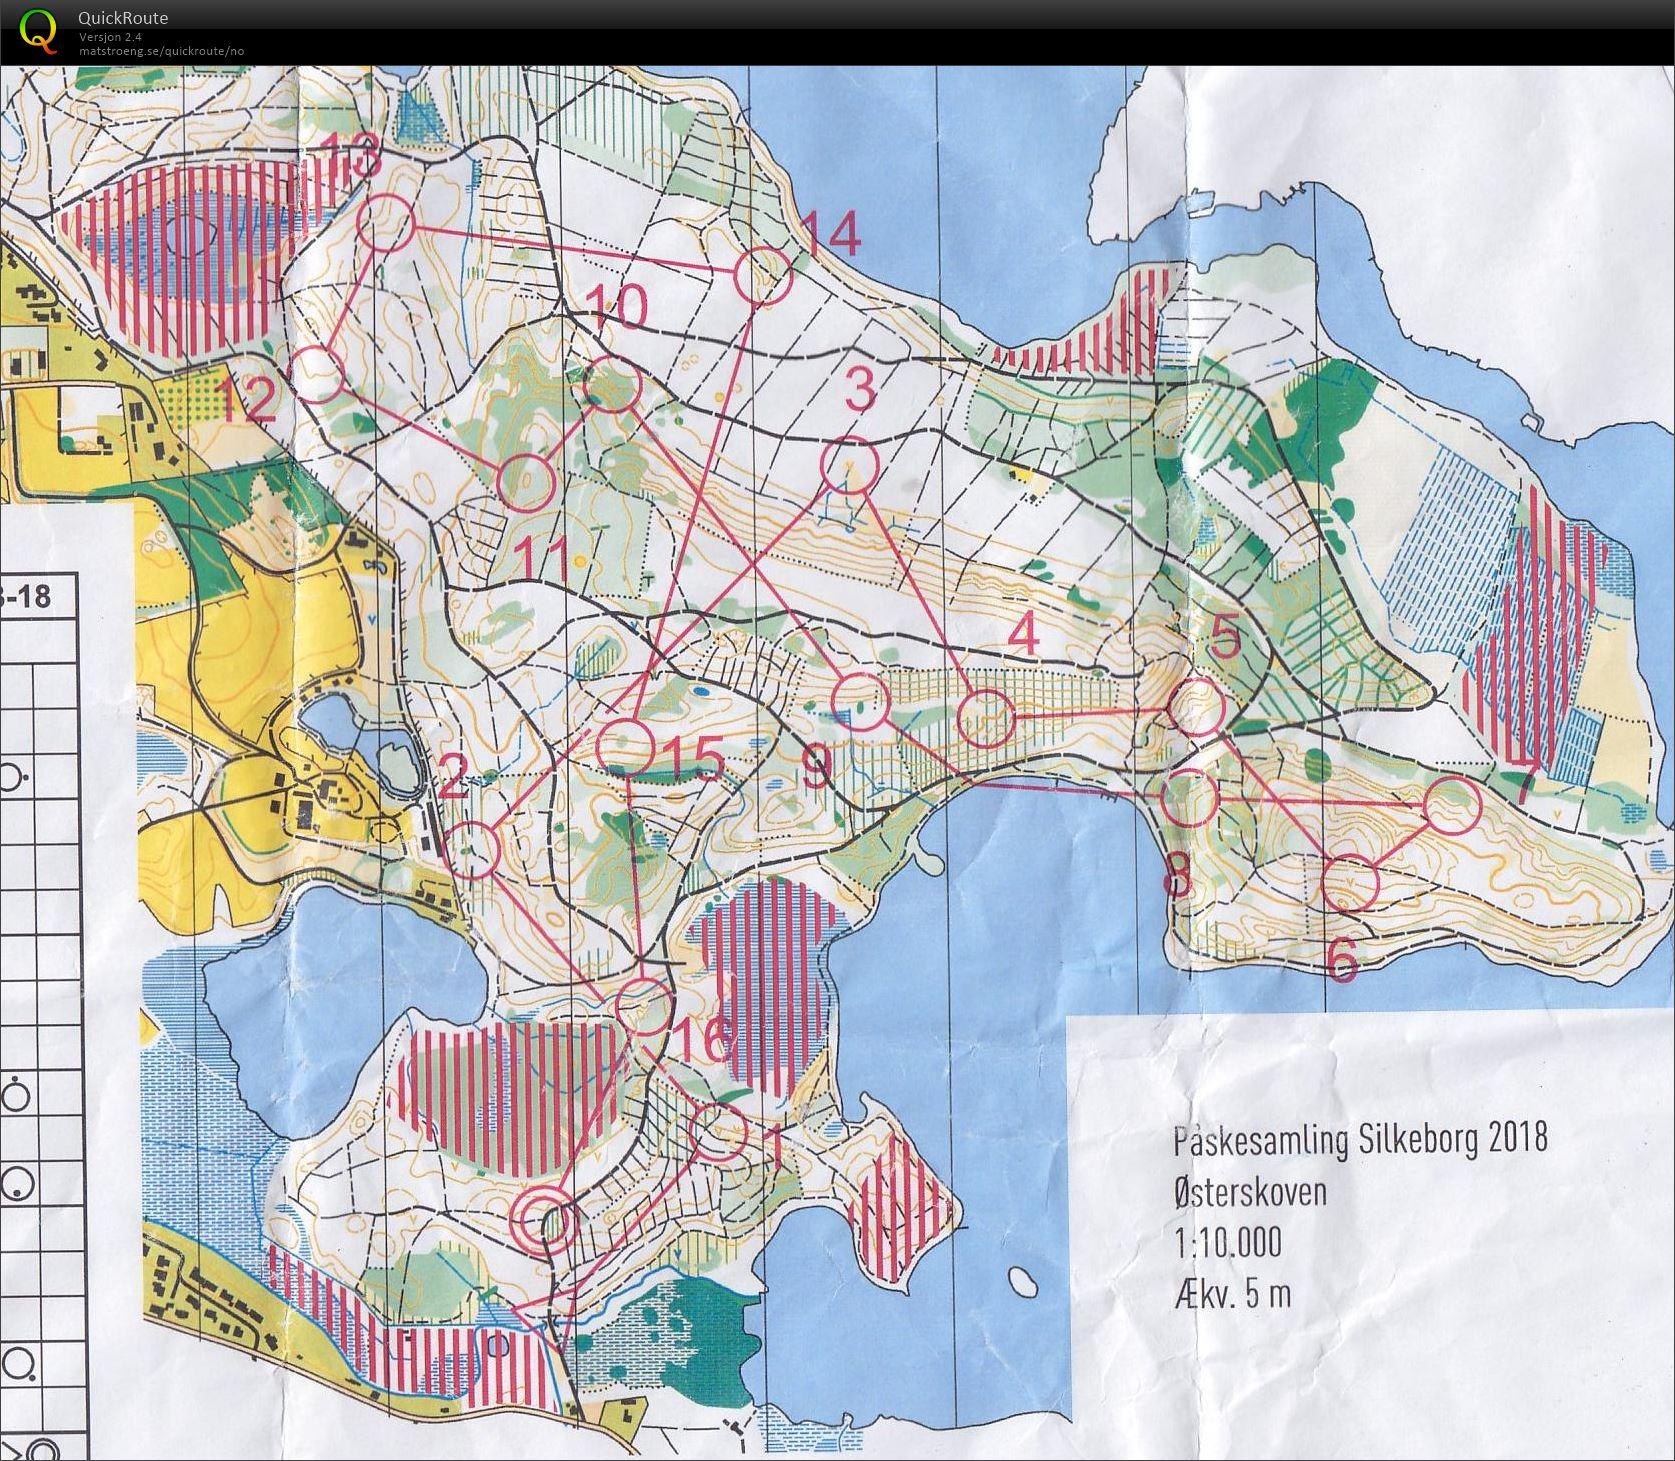 Påskesamling Silkeborg #1 - March 26th 2018 - Orienteering Map from ...